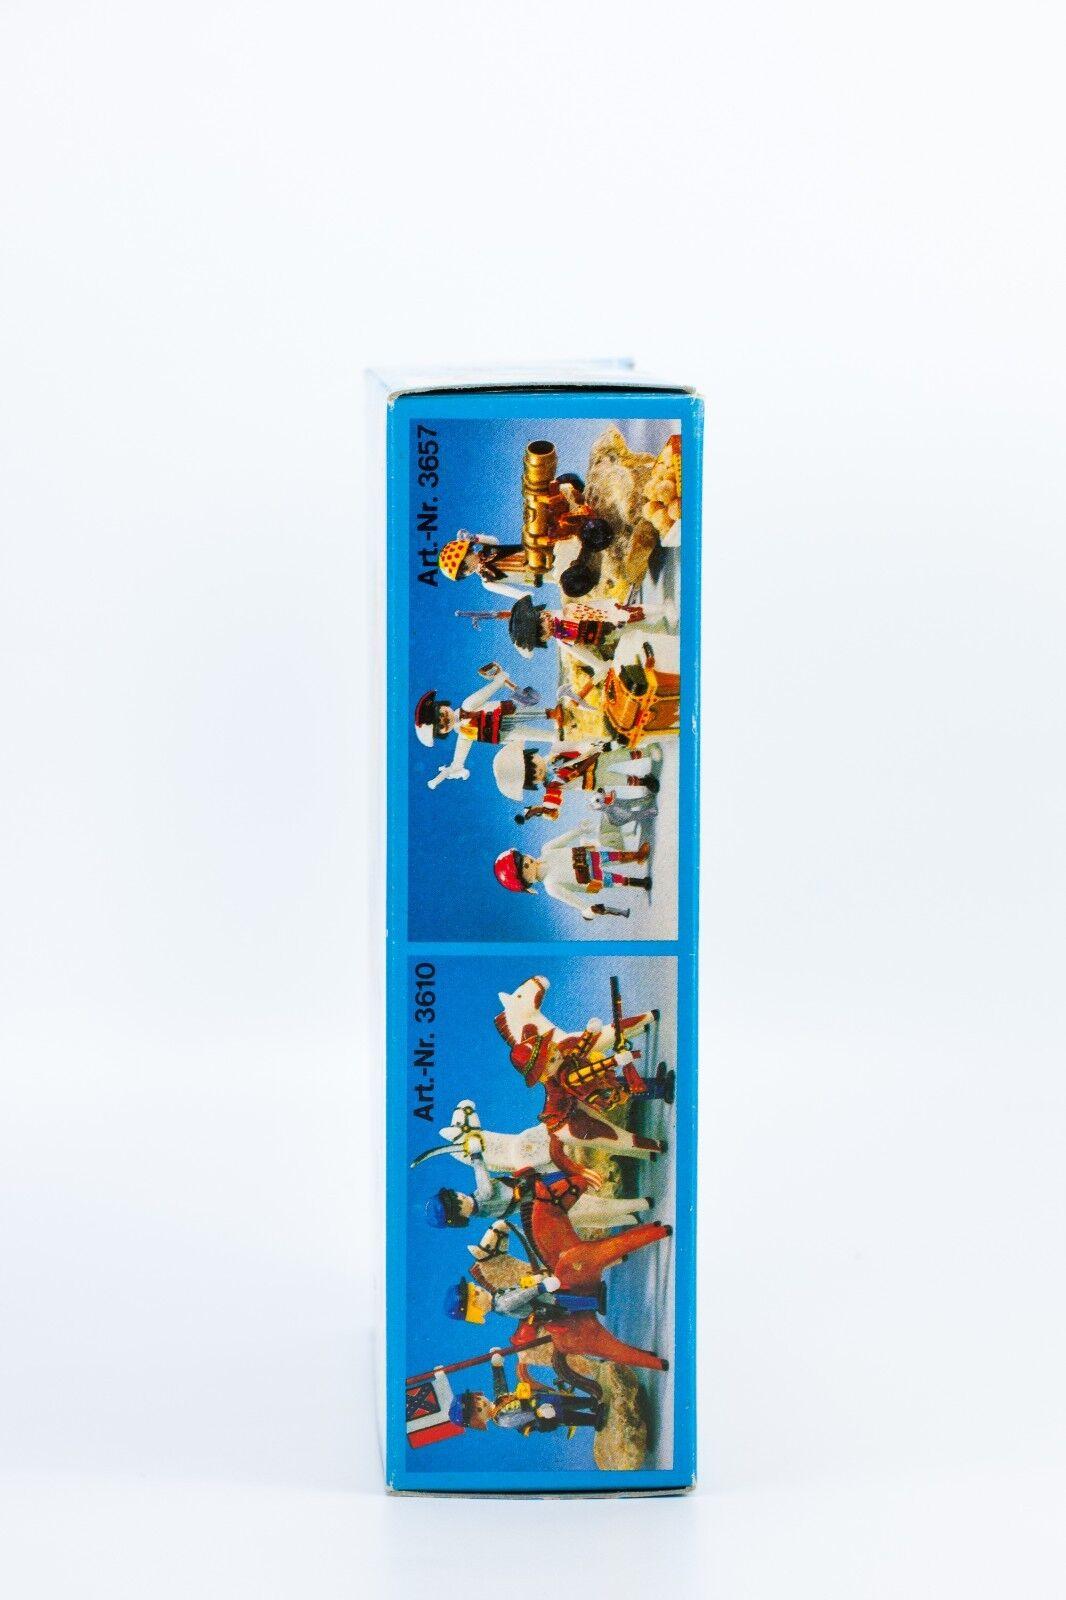 VERY RARE Playmobil Farbe LYRA 3635 GREECE 1976 1976 1976 WINTER SPORTS SKI SLEIGH HOCKEY f17e2e